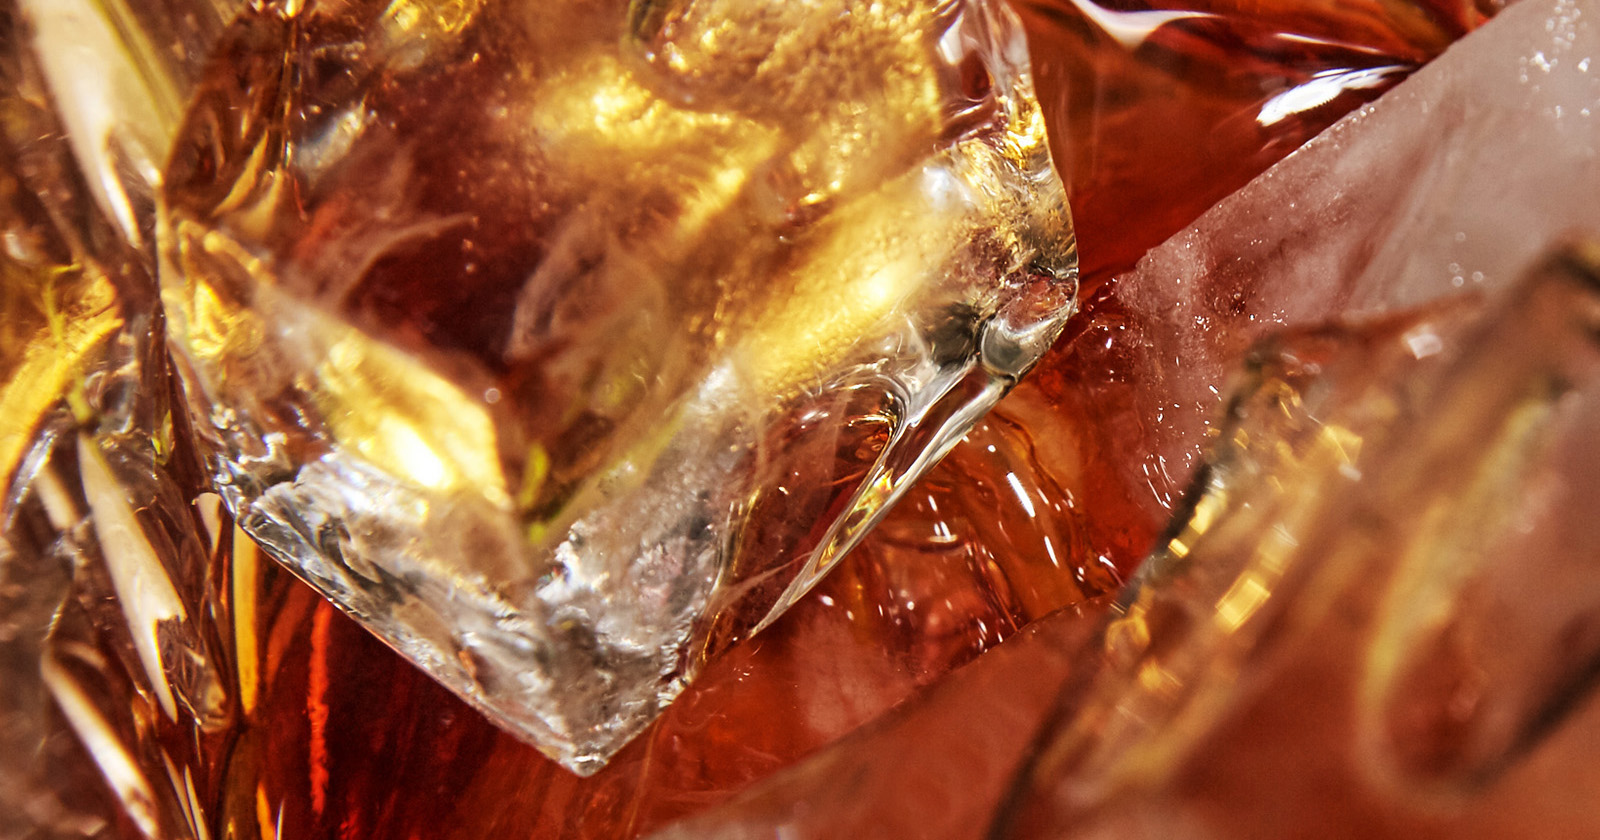 drink_0883.jpg